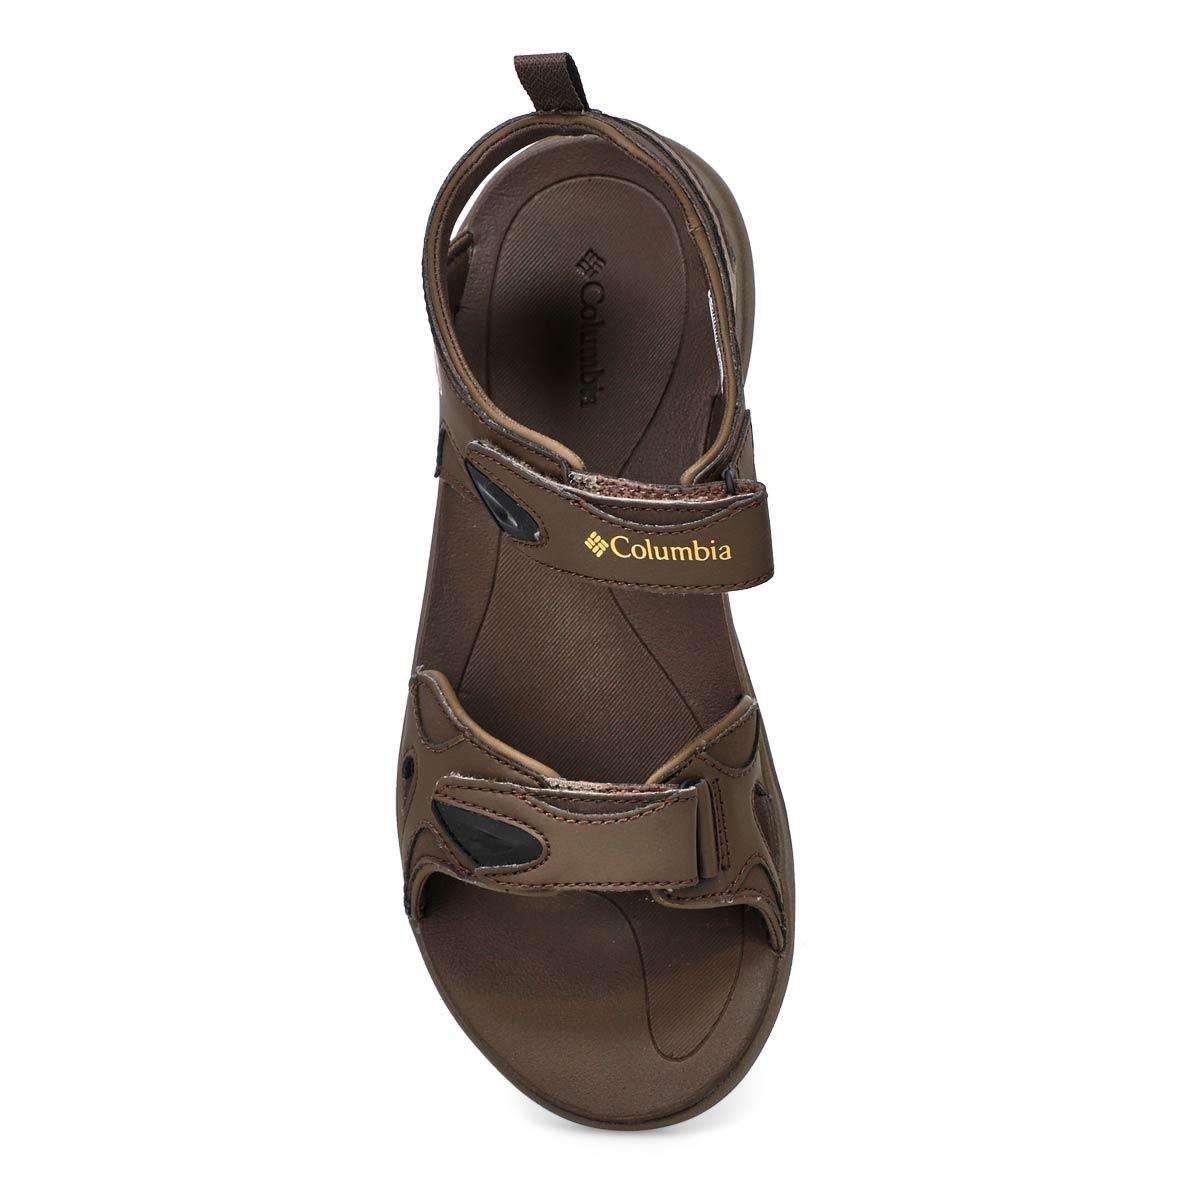 Men's Columbia Sport Sandal - Cordoanv/Curry